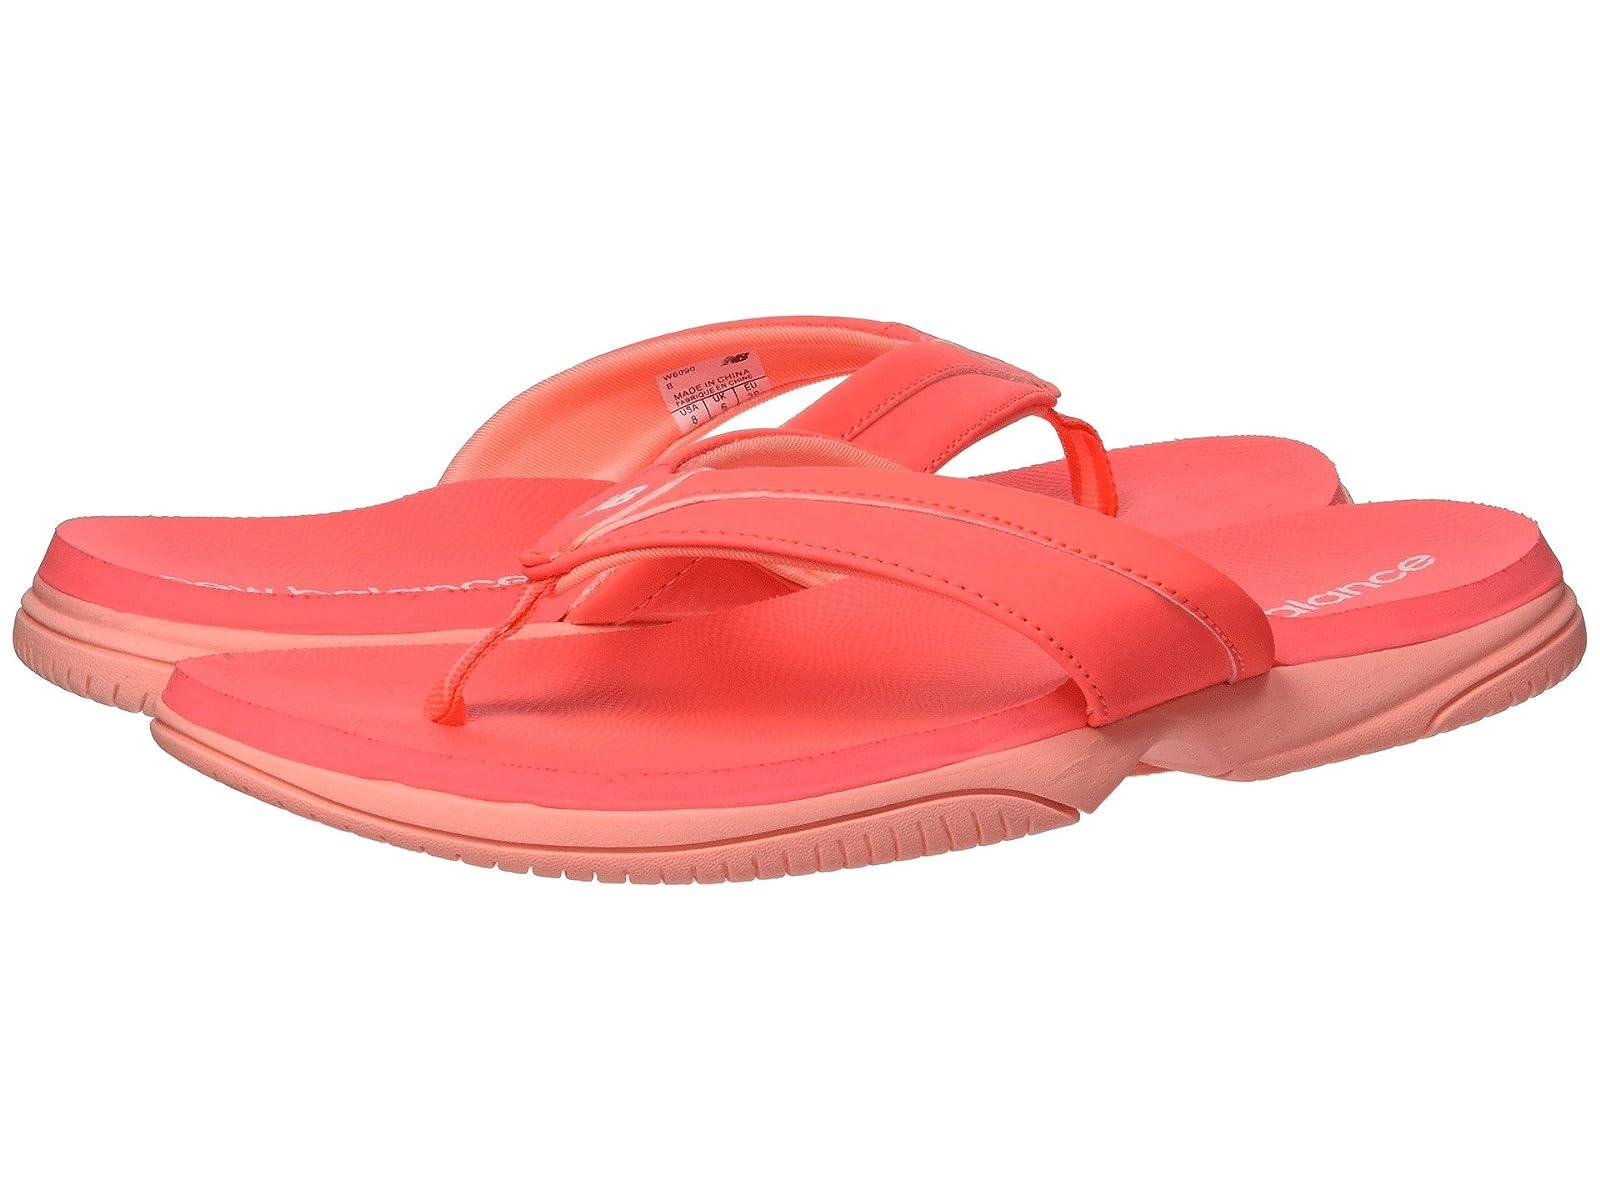 New Balance JoJo ThongAtmospheric grades have affordable shoes